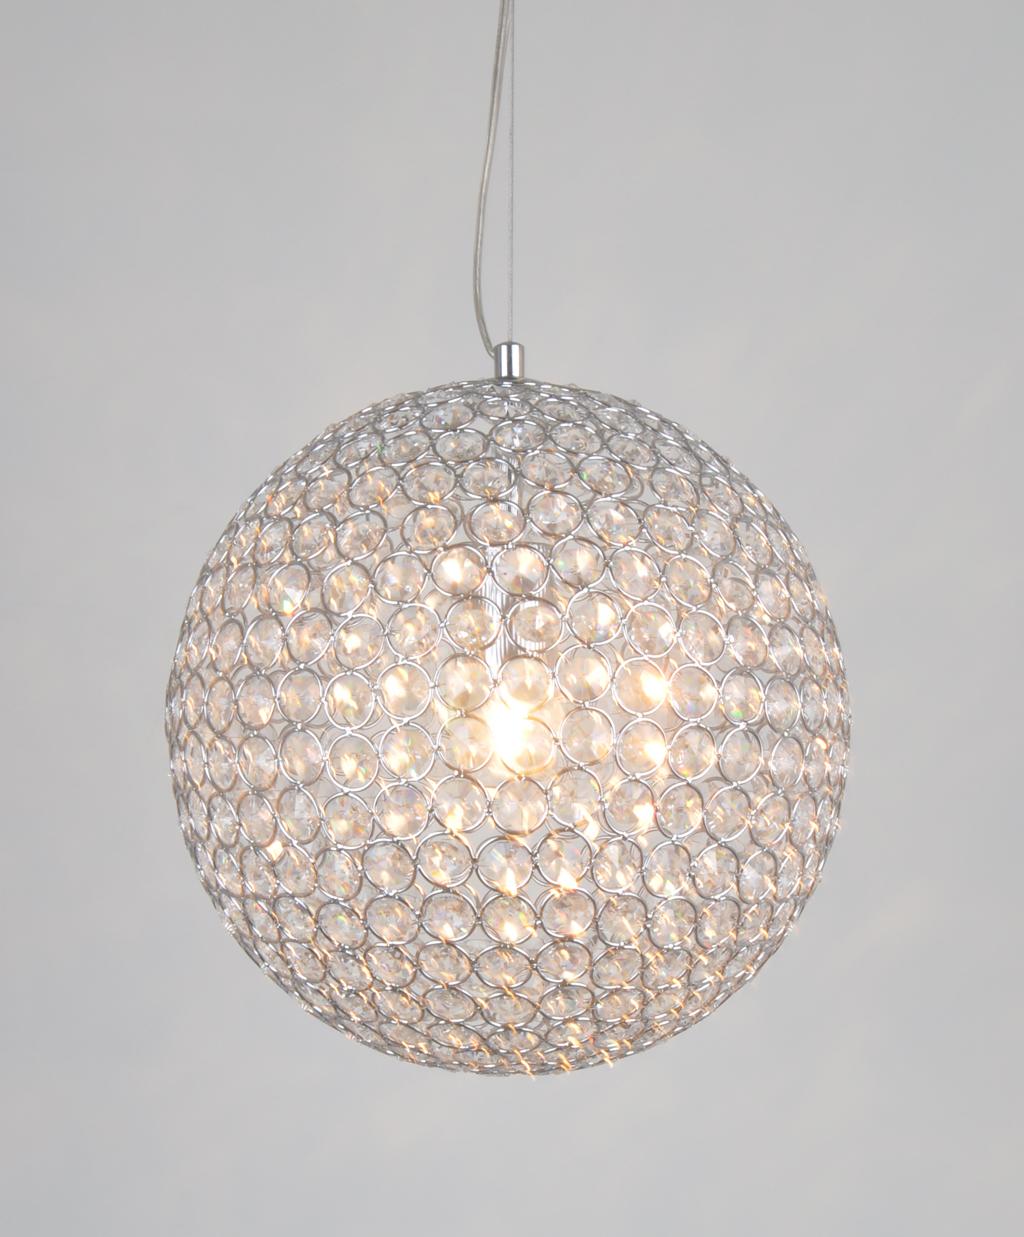 Image of: Ihausexpress Contemporary K9 Crystal Ball Pendant Light